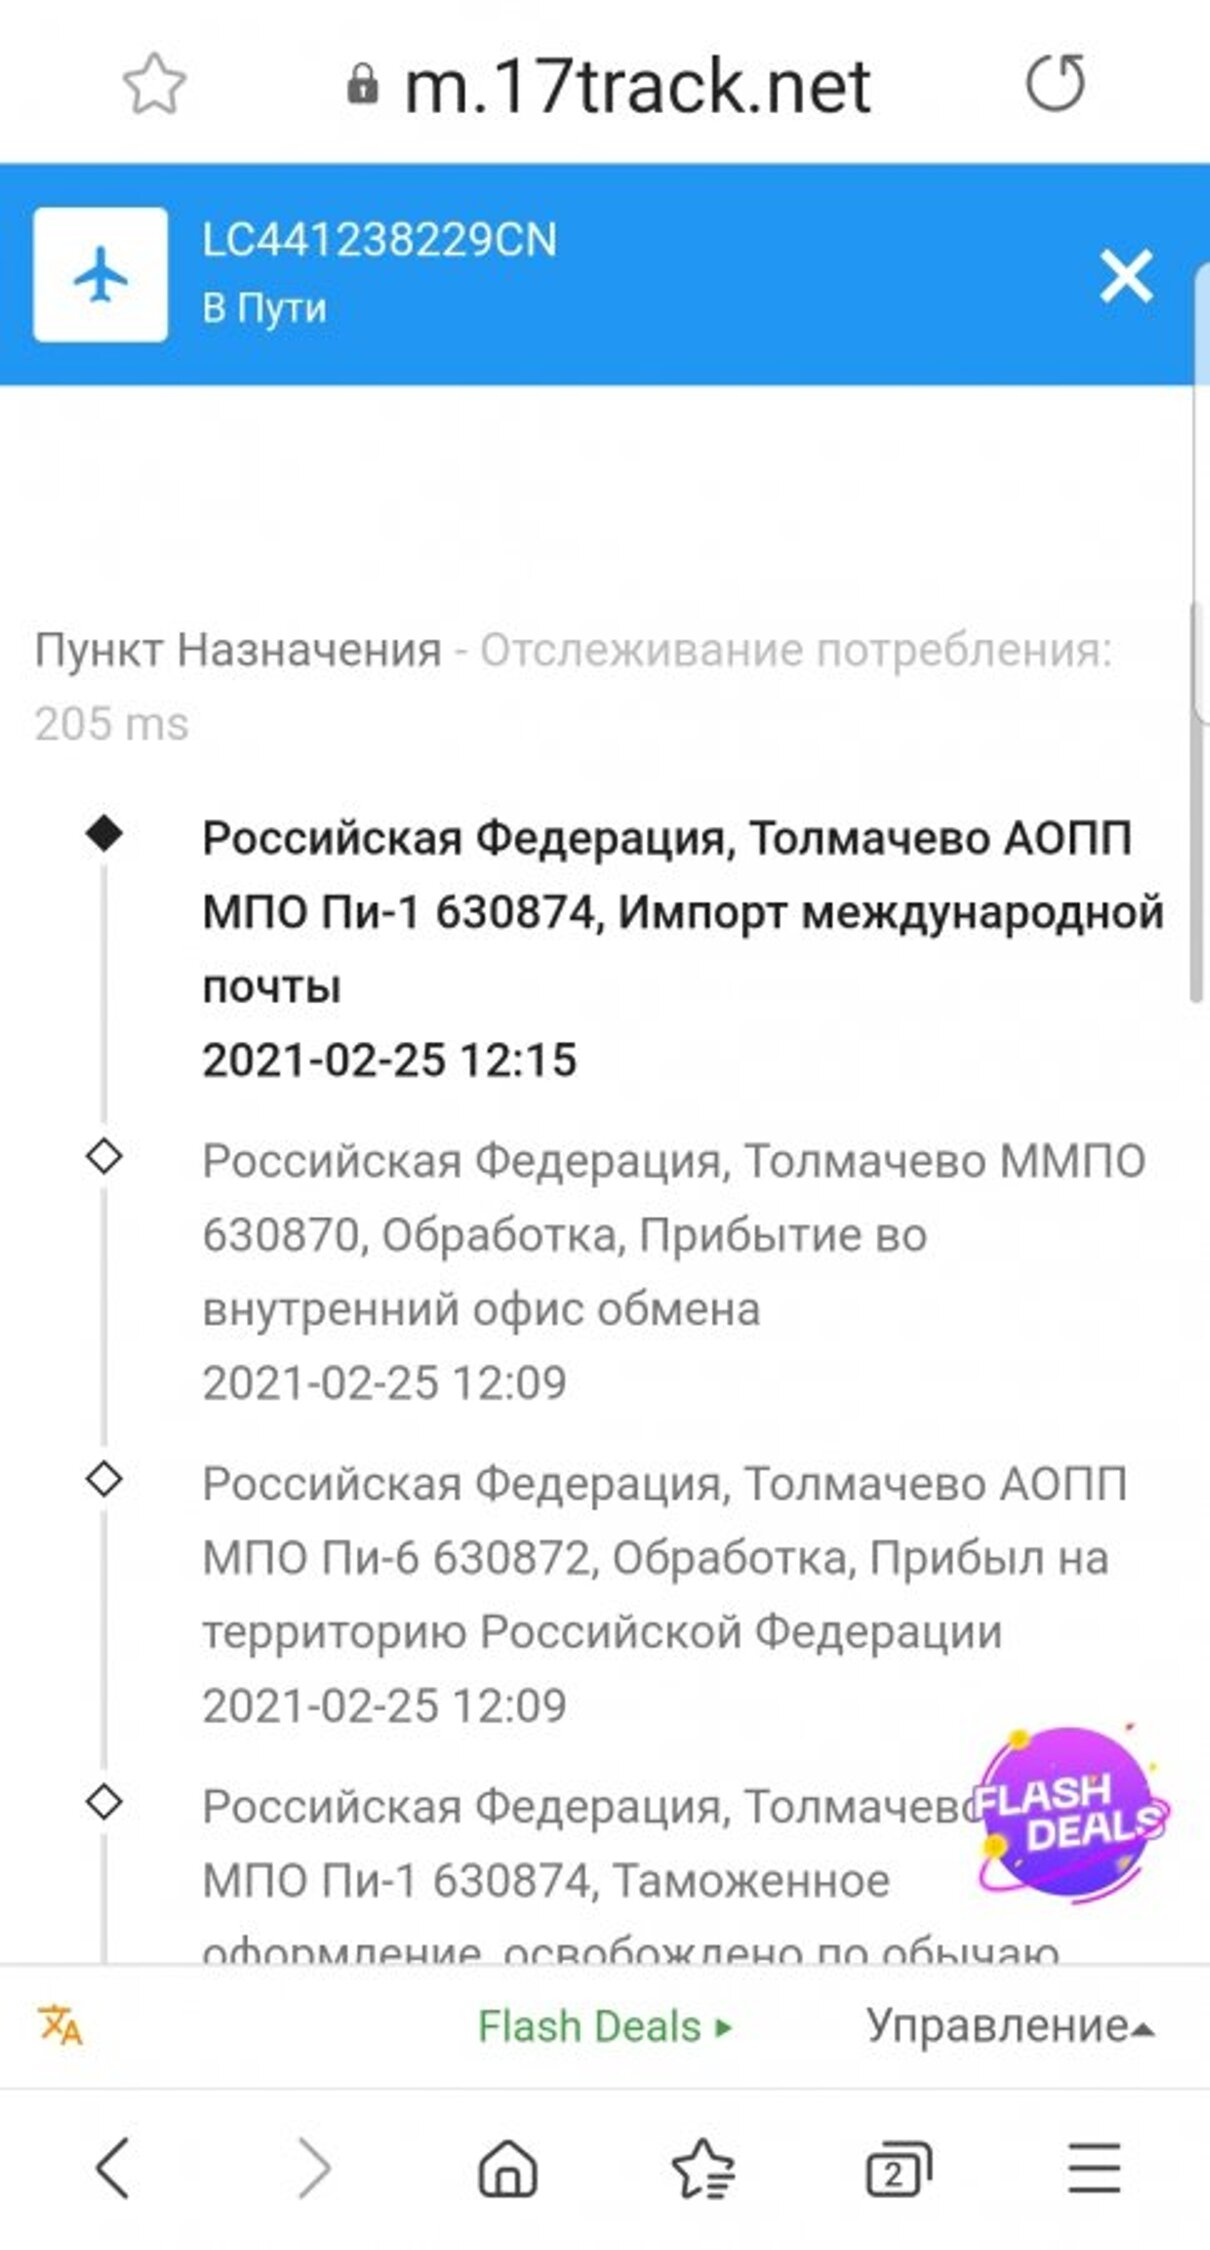 Жалоба-отзыв: Толмачёво АОПП ММПО PI-1 - Пропала посылка.  Фото №2